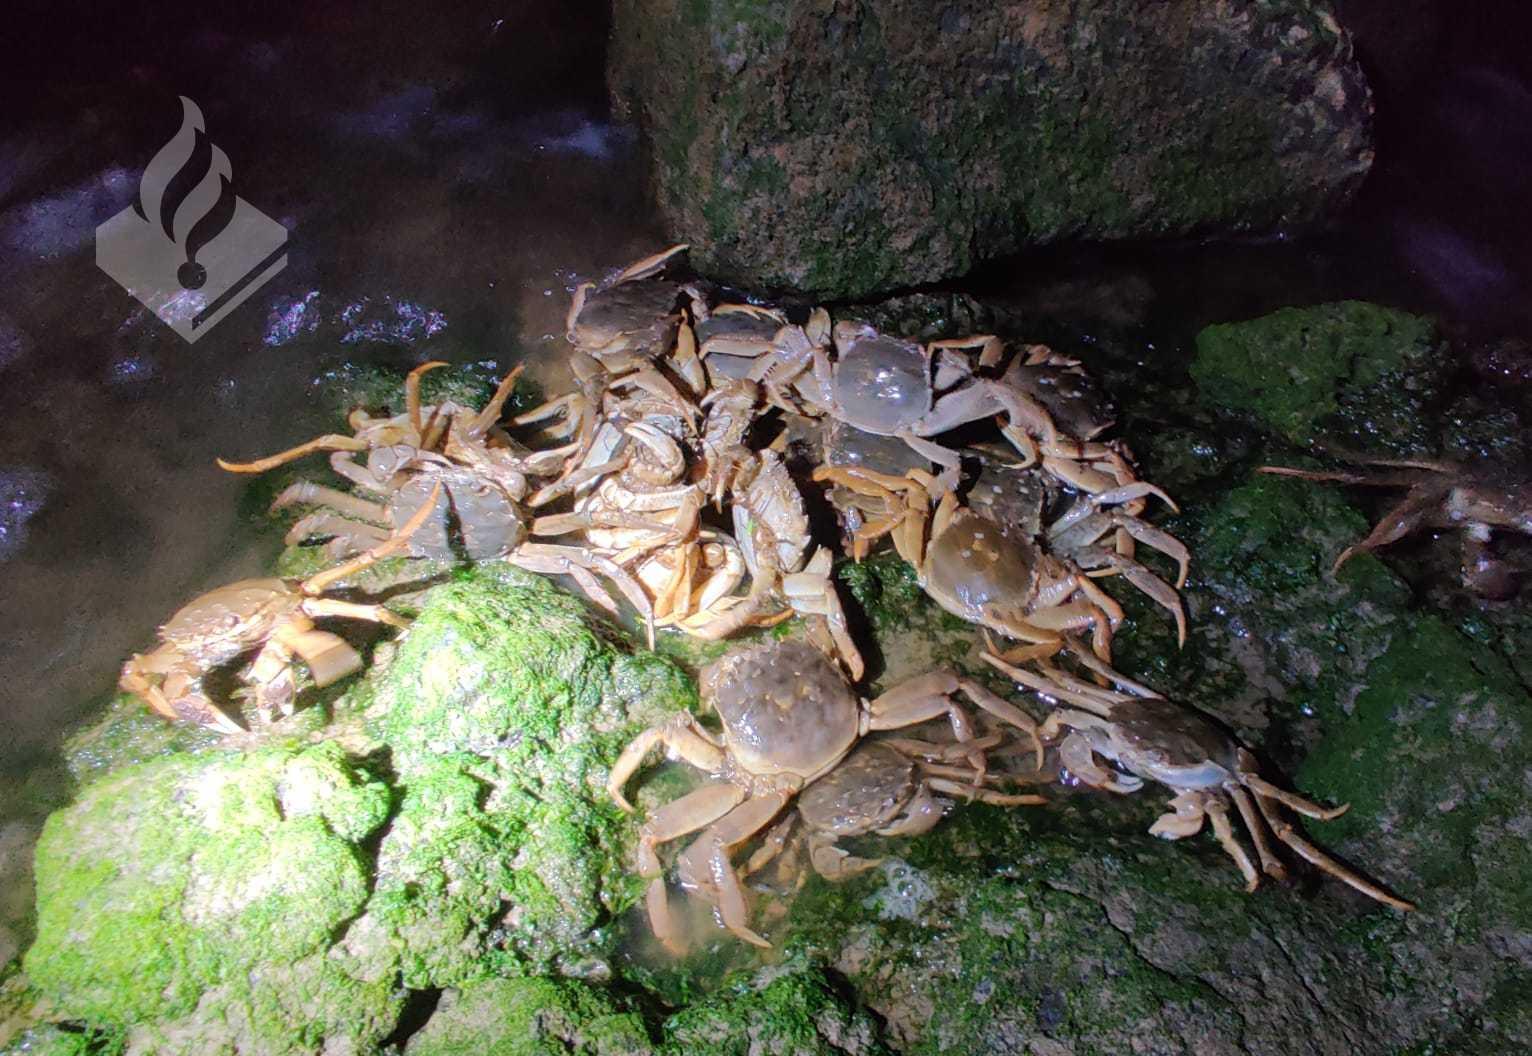 Twee krabbevangers op heterdaad betrapt